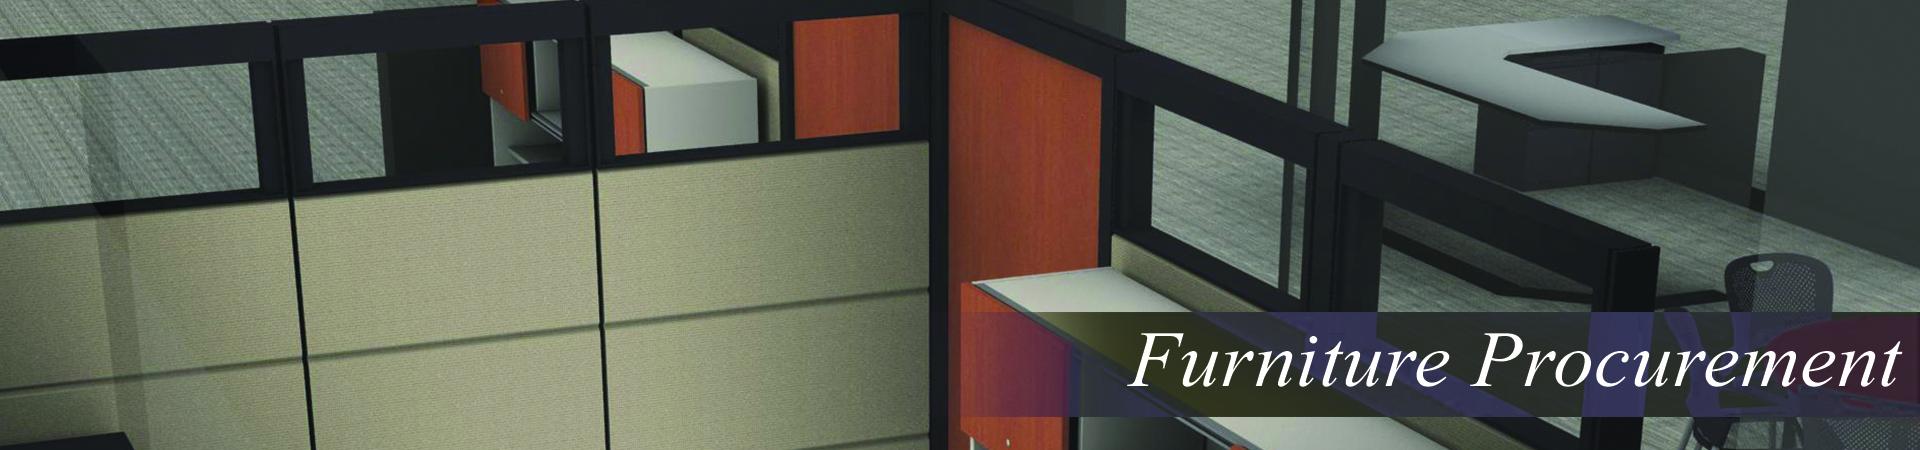 Furniture Procurement